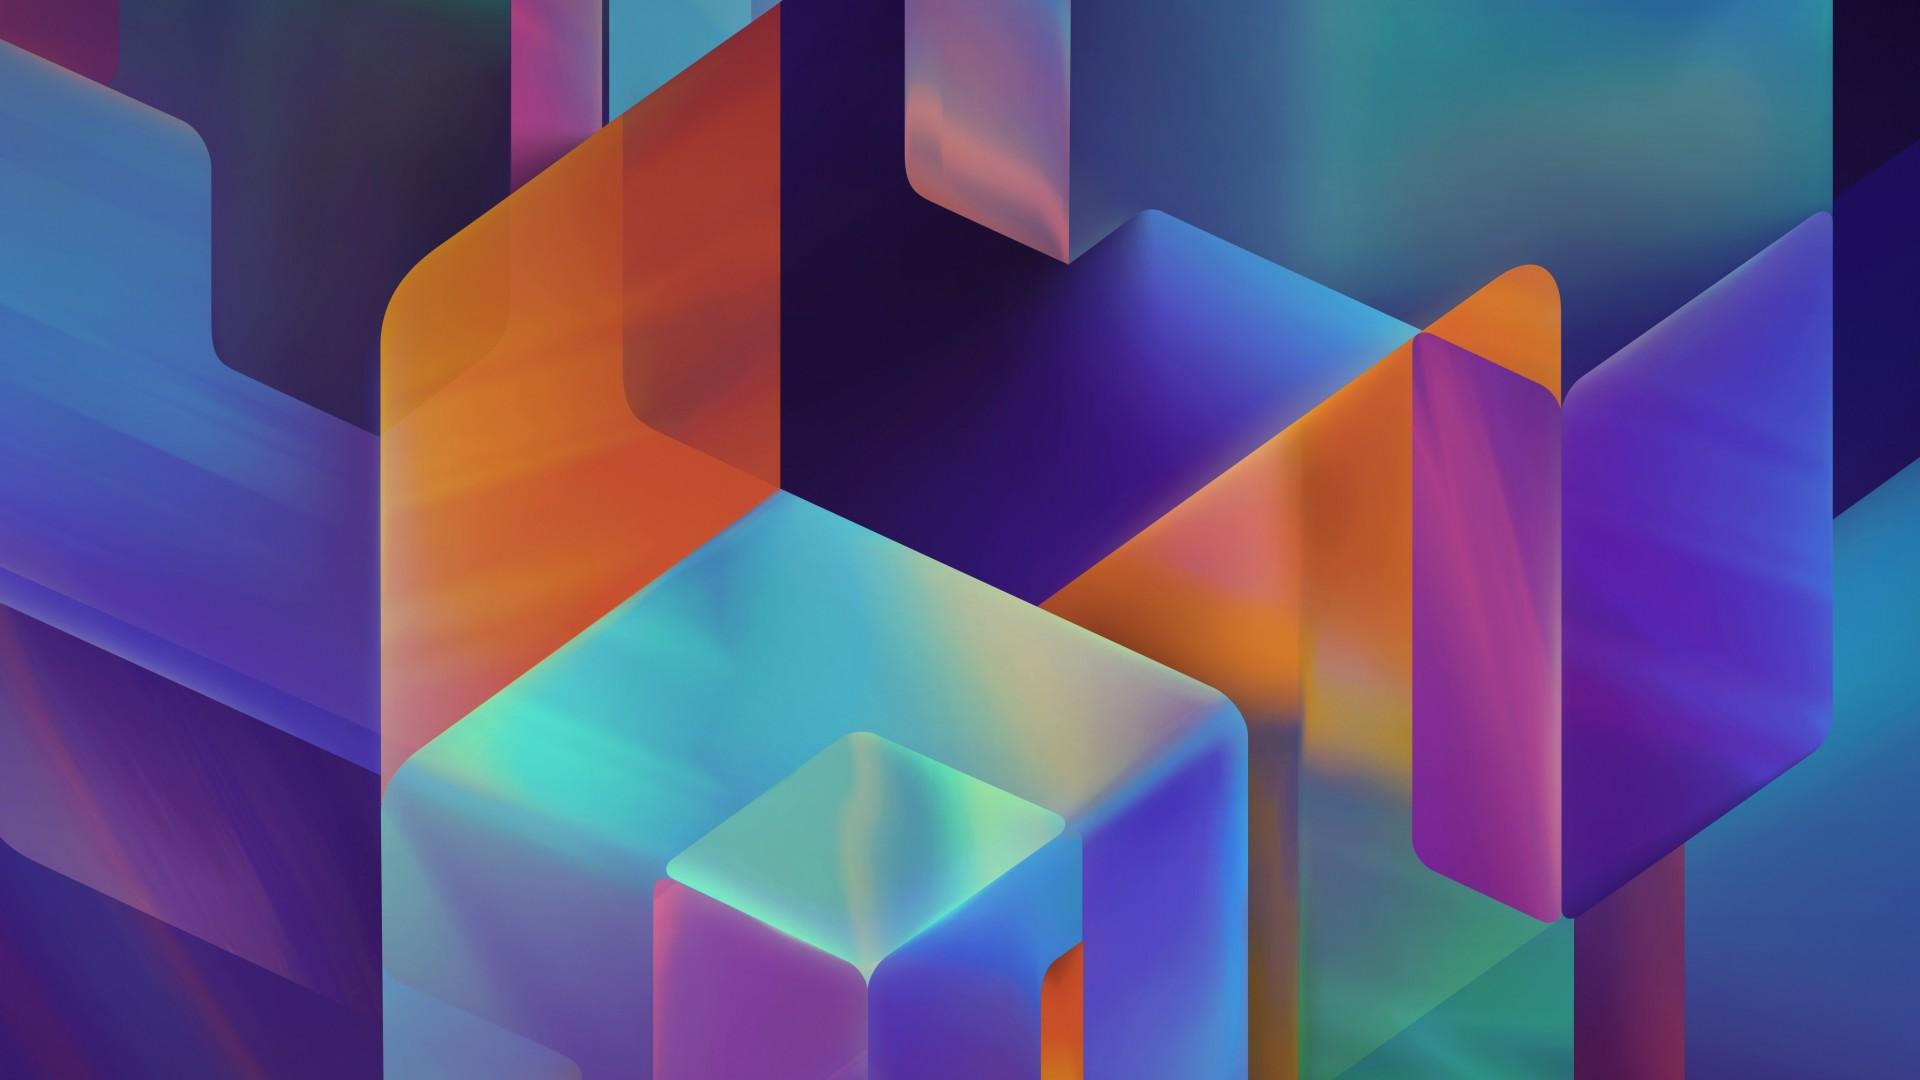 Wallpaper Quotes For Macbook Wallpaper Android 4k 5k Wallpaper Hd Samsung Cubes